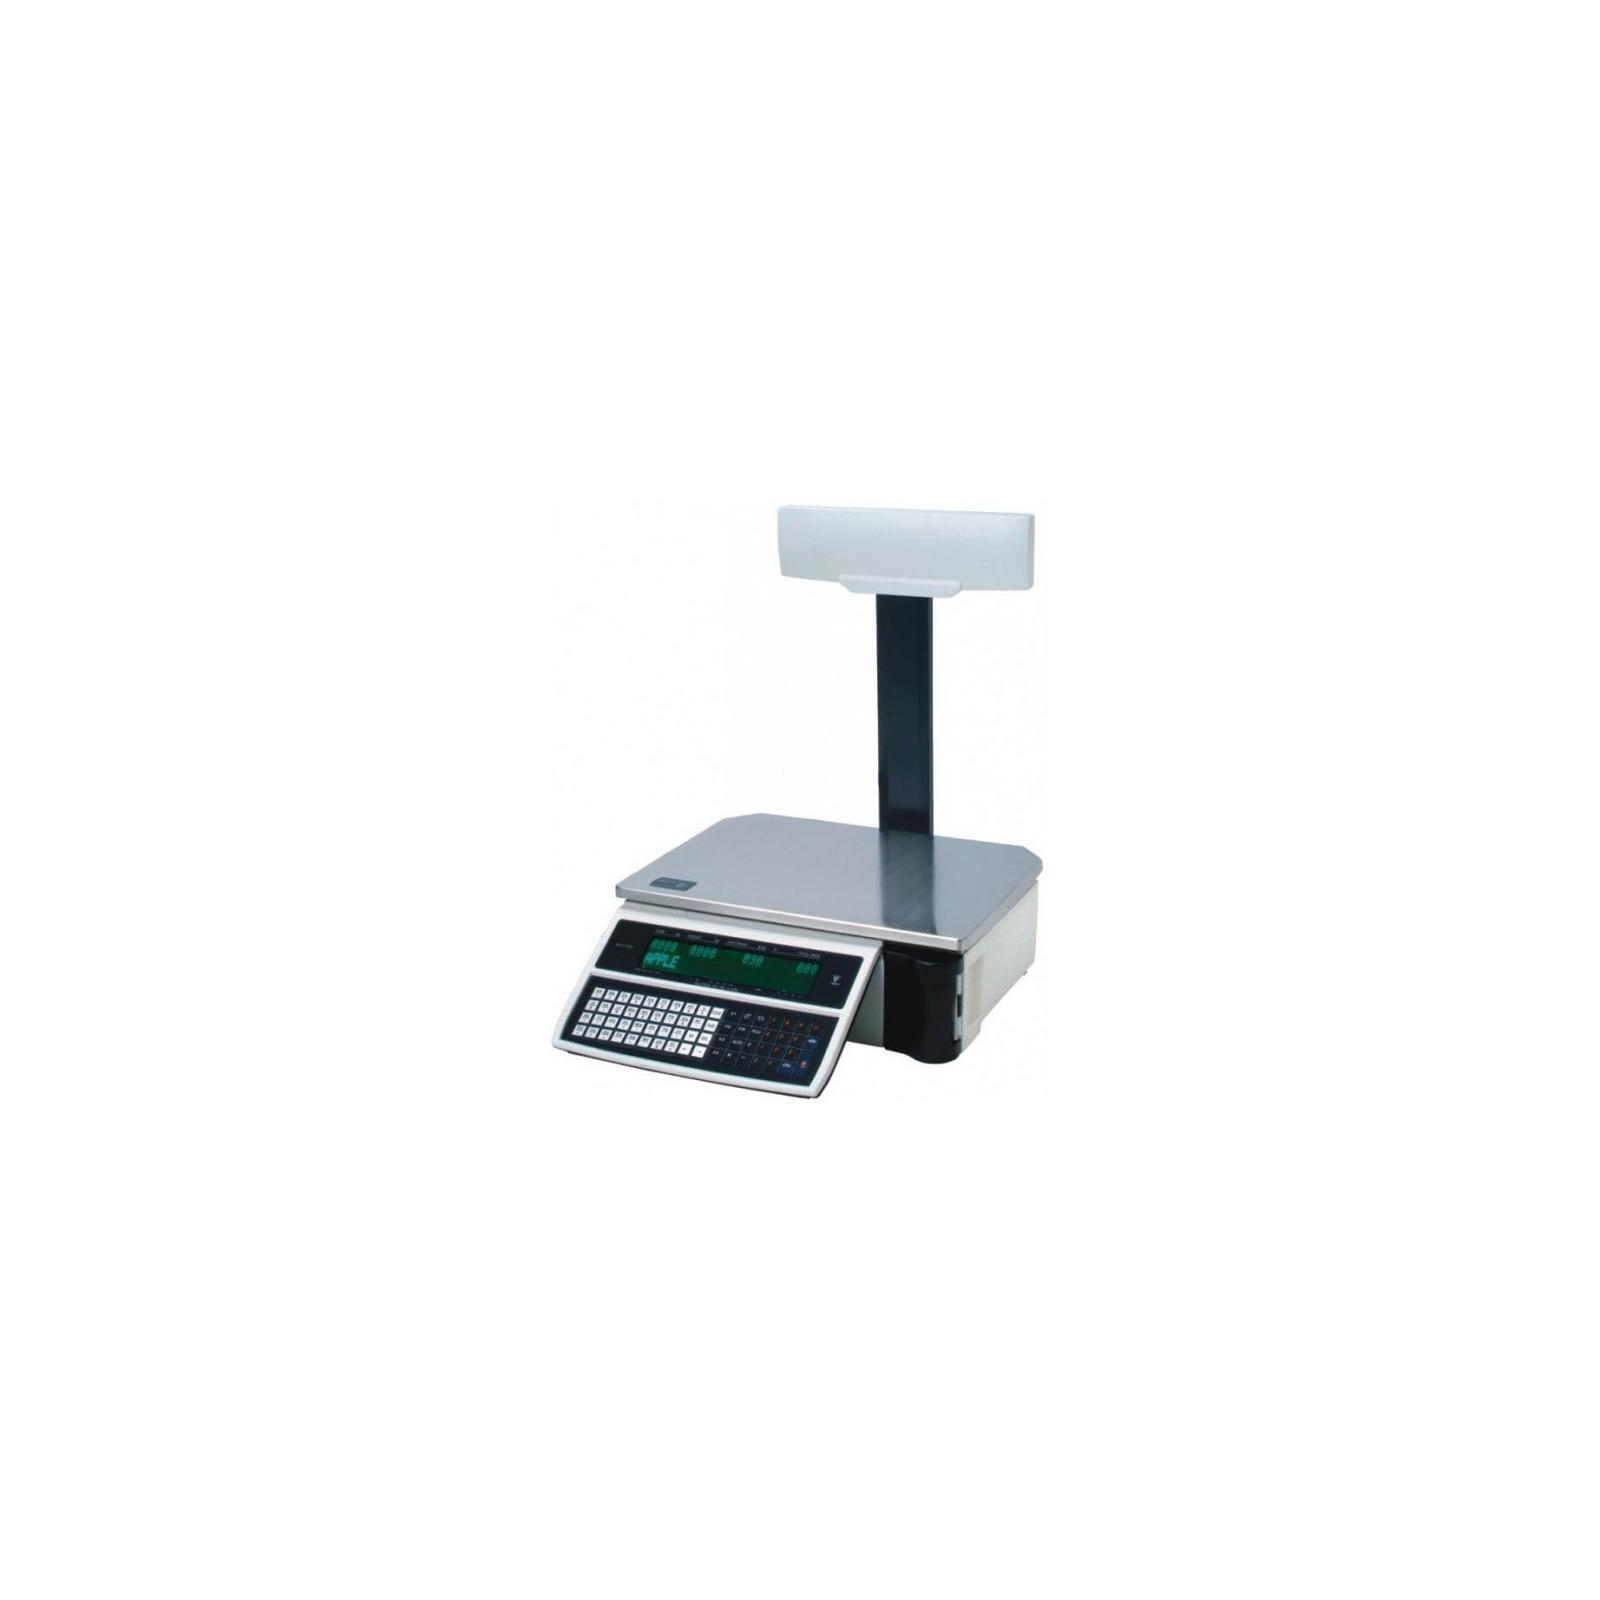 Весы DIGI SM 100 P Plus Ethernet 6kg (2060100074)